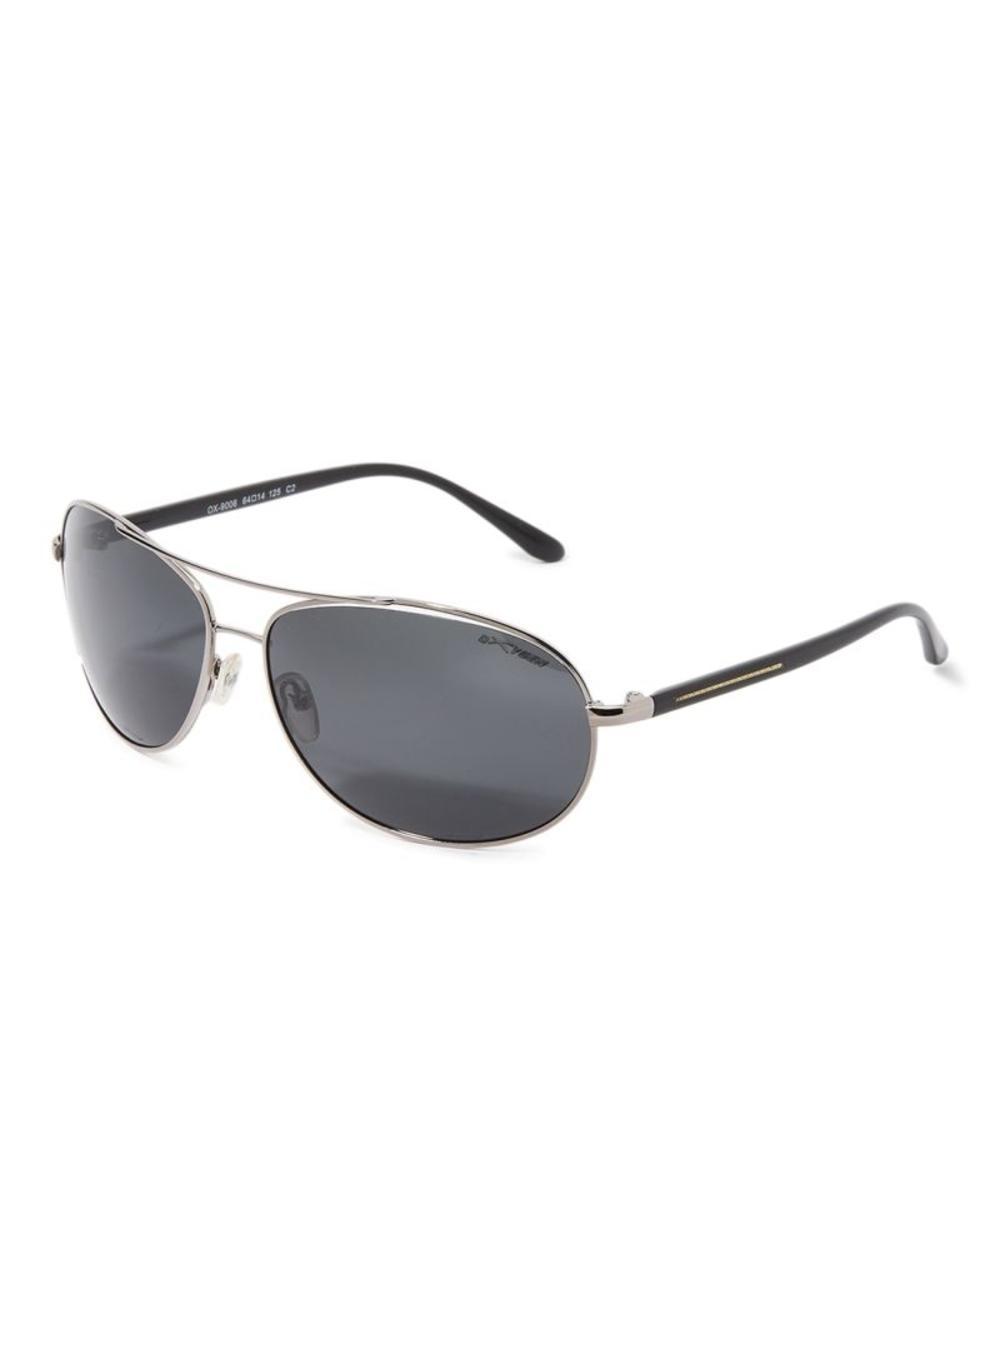 OXYGEN Unisex Aviator Shape UV Protection Sunglasses OX9006-C2